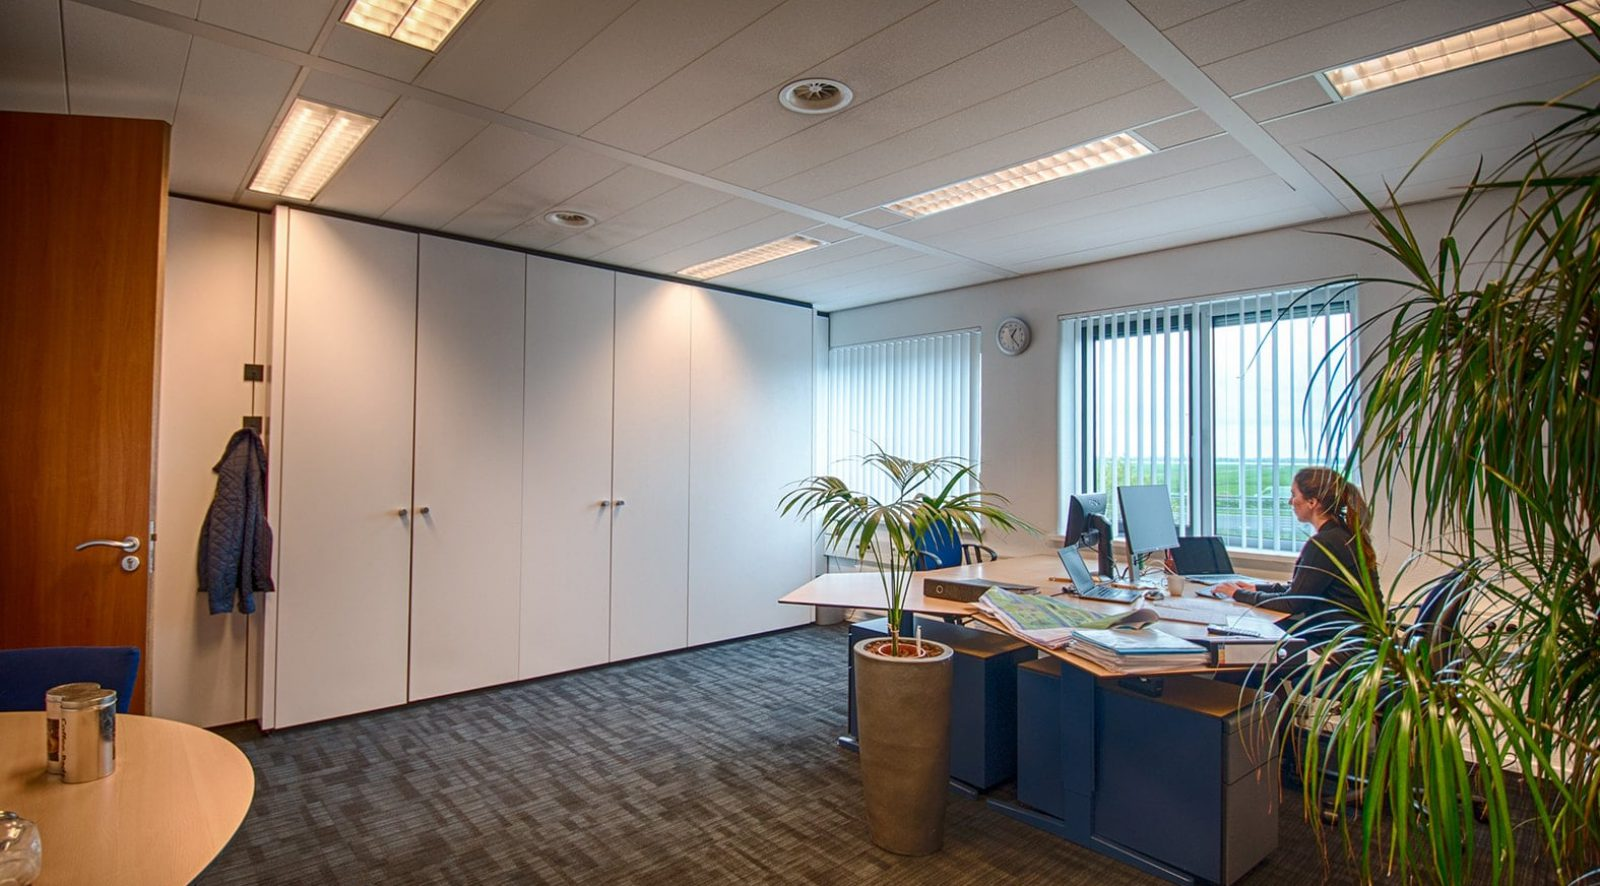 Kantoor Bodegraven | Crown Business Center Bodegraven